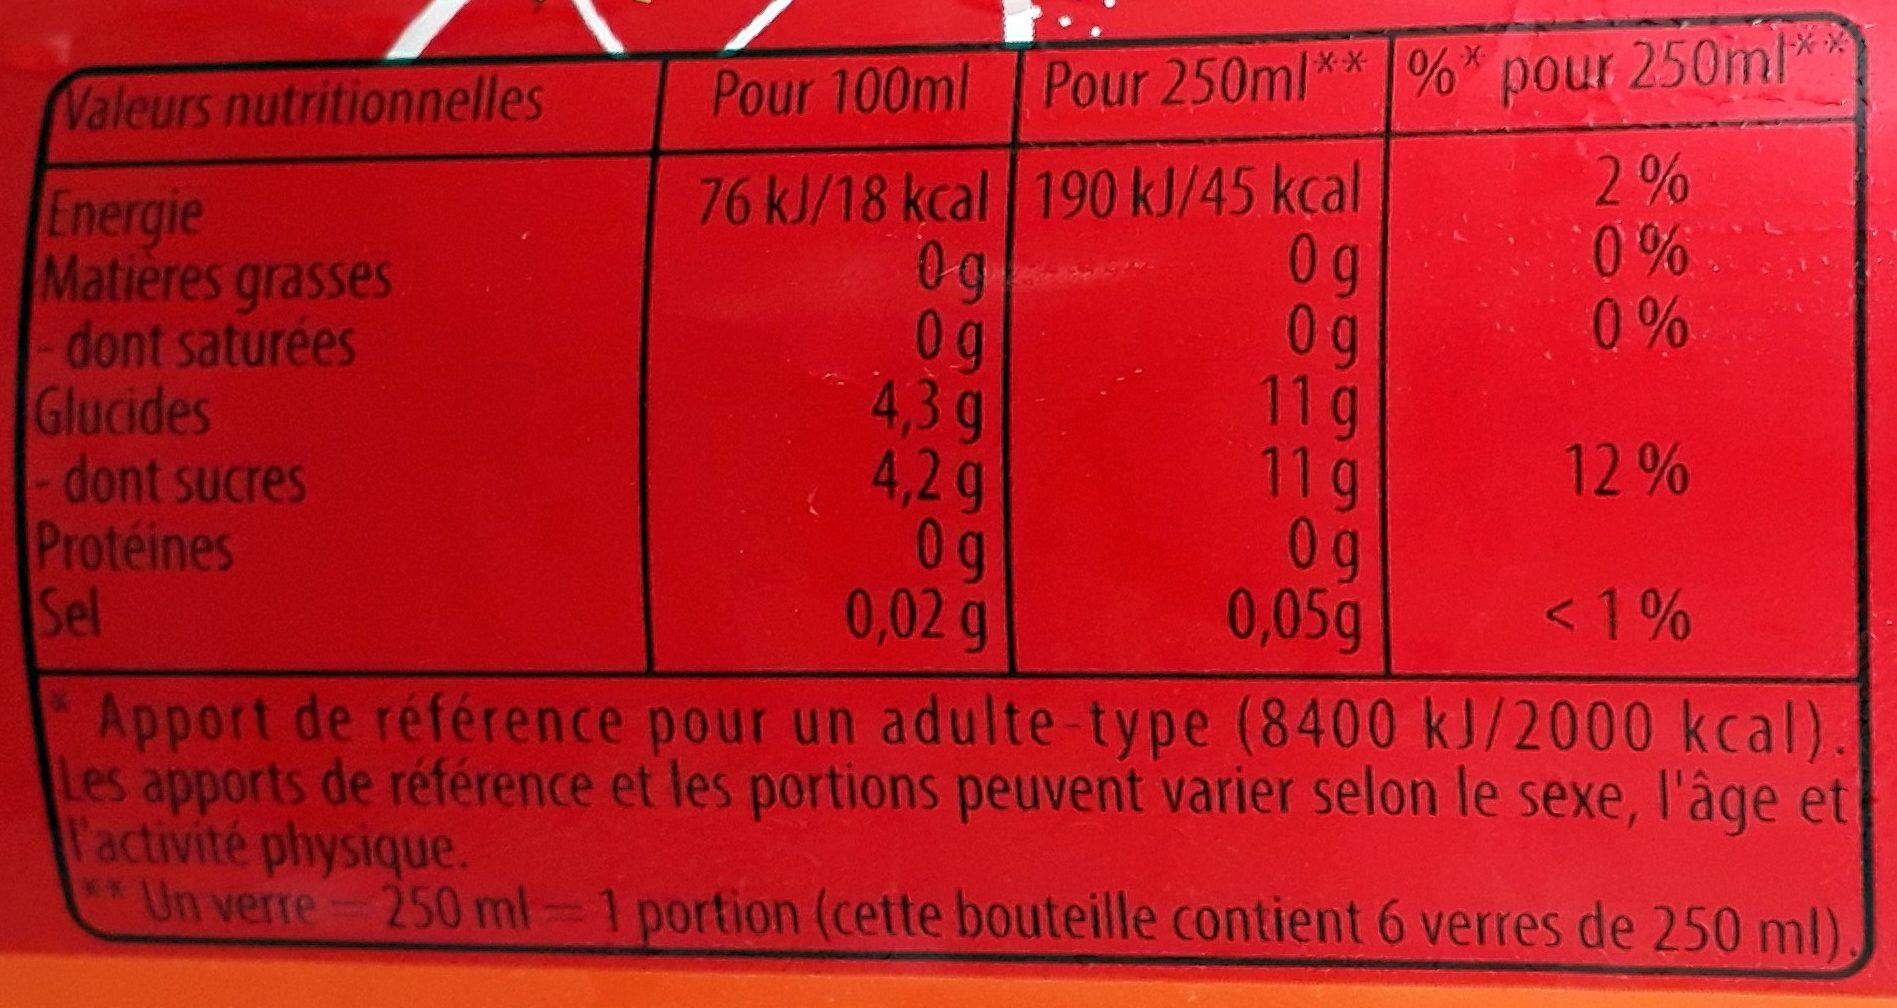 Lipton Ice Tea duo saveur pêche fraise 1,5 L - Valori nutrizionali - fr